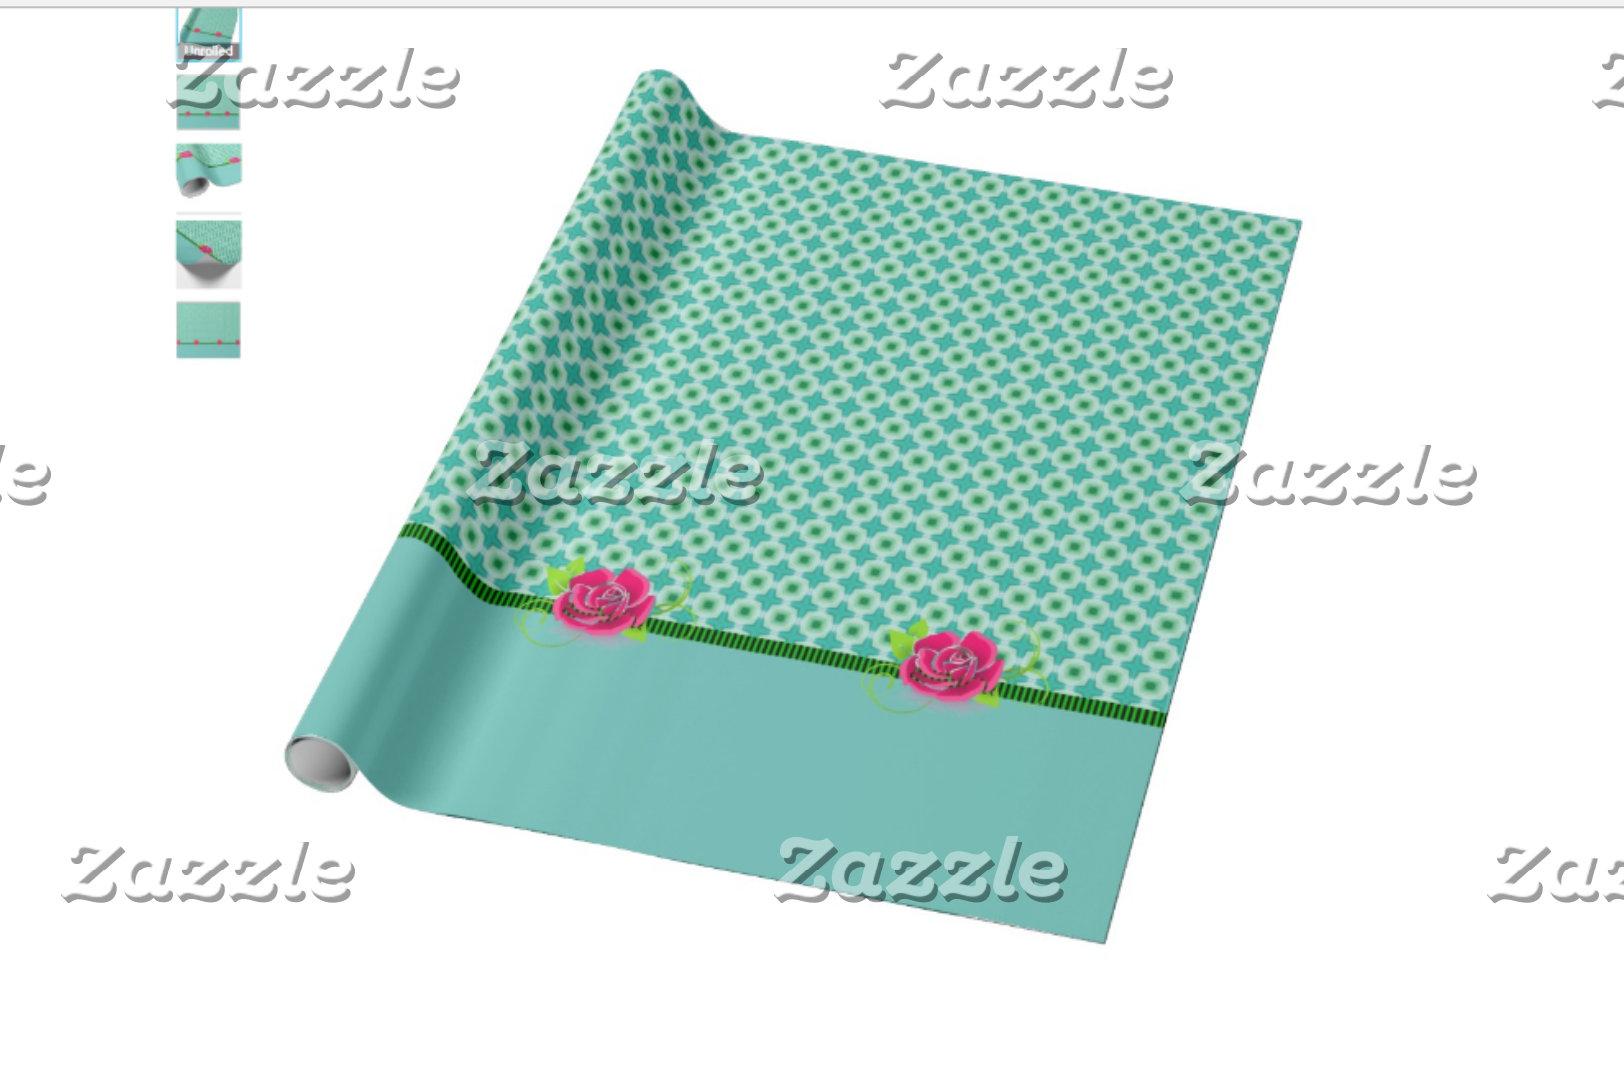 Aqua & Green Polka Dots with Roses